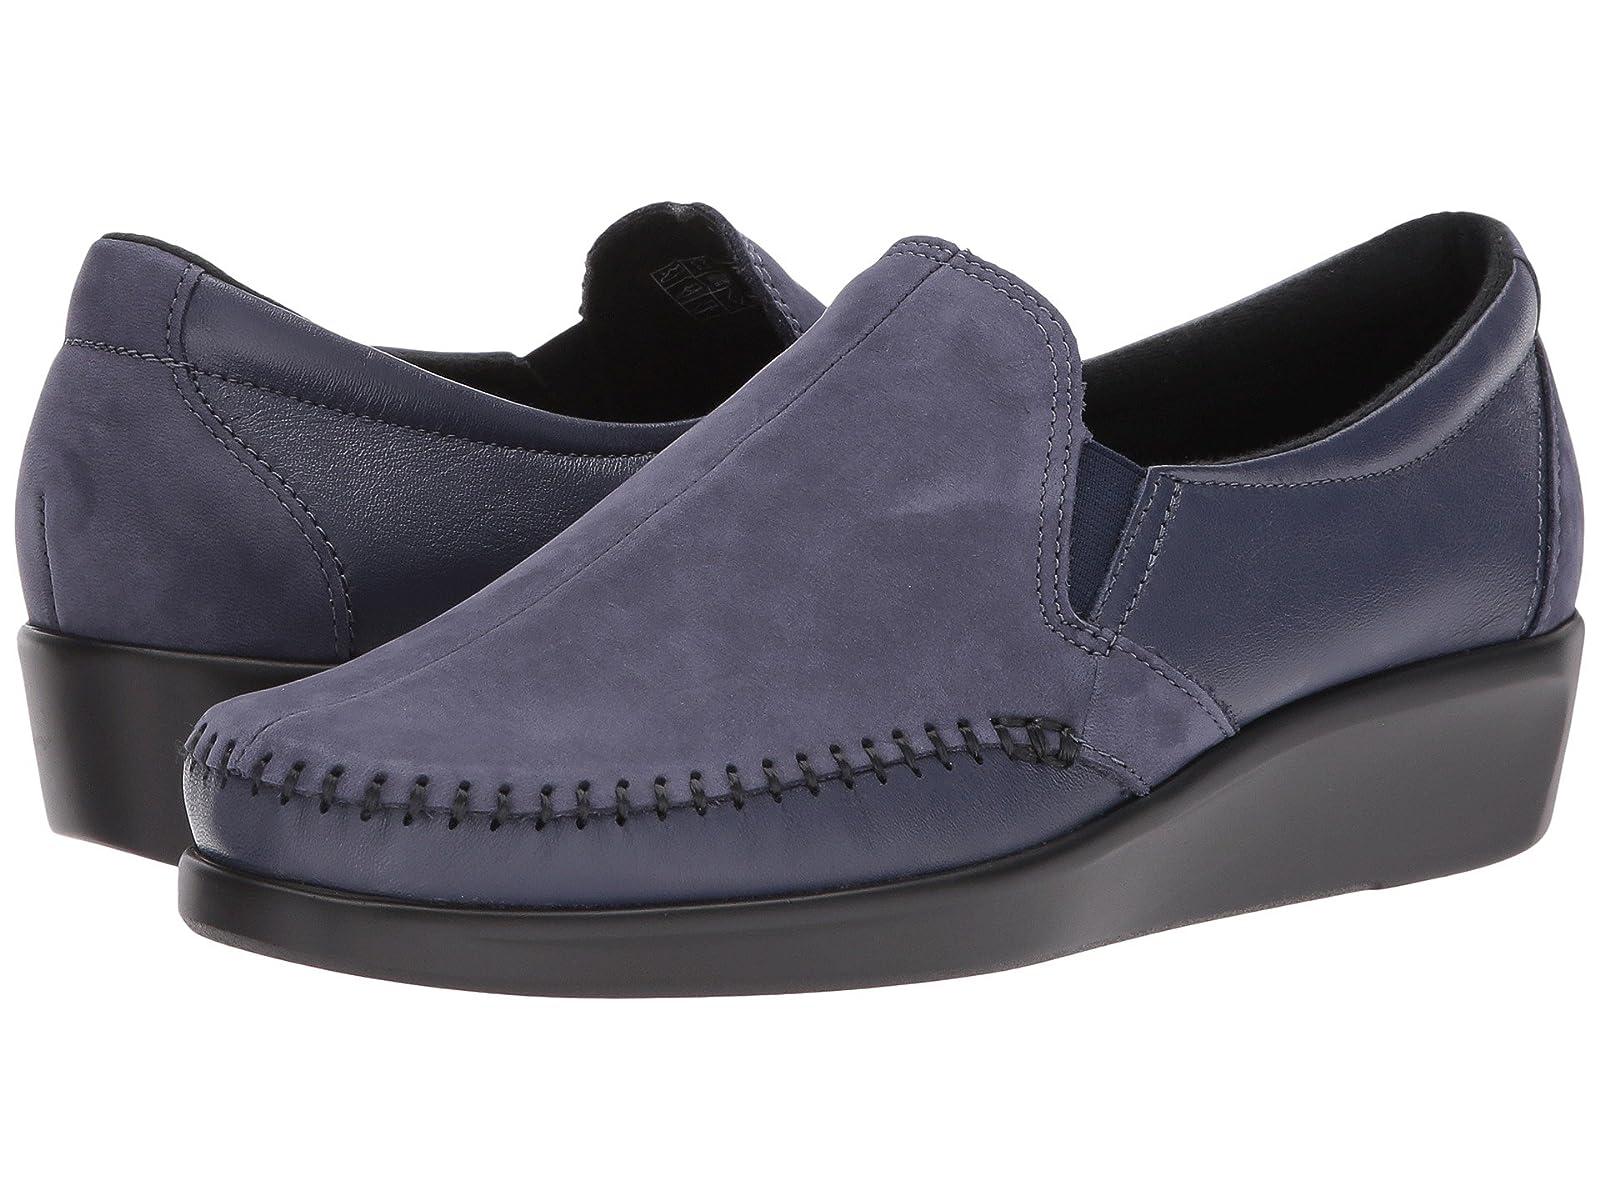 SAS DreamAtmospheric grades have affordable shoes